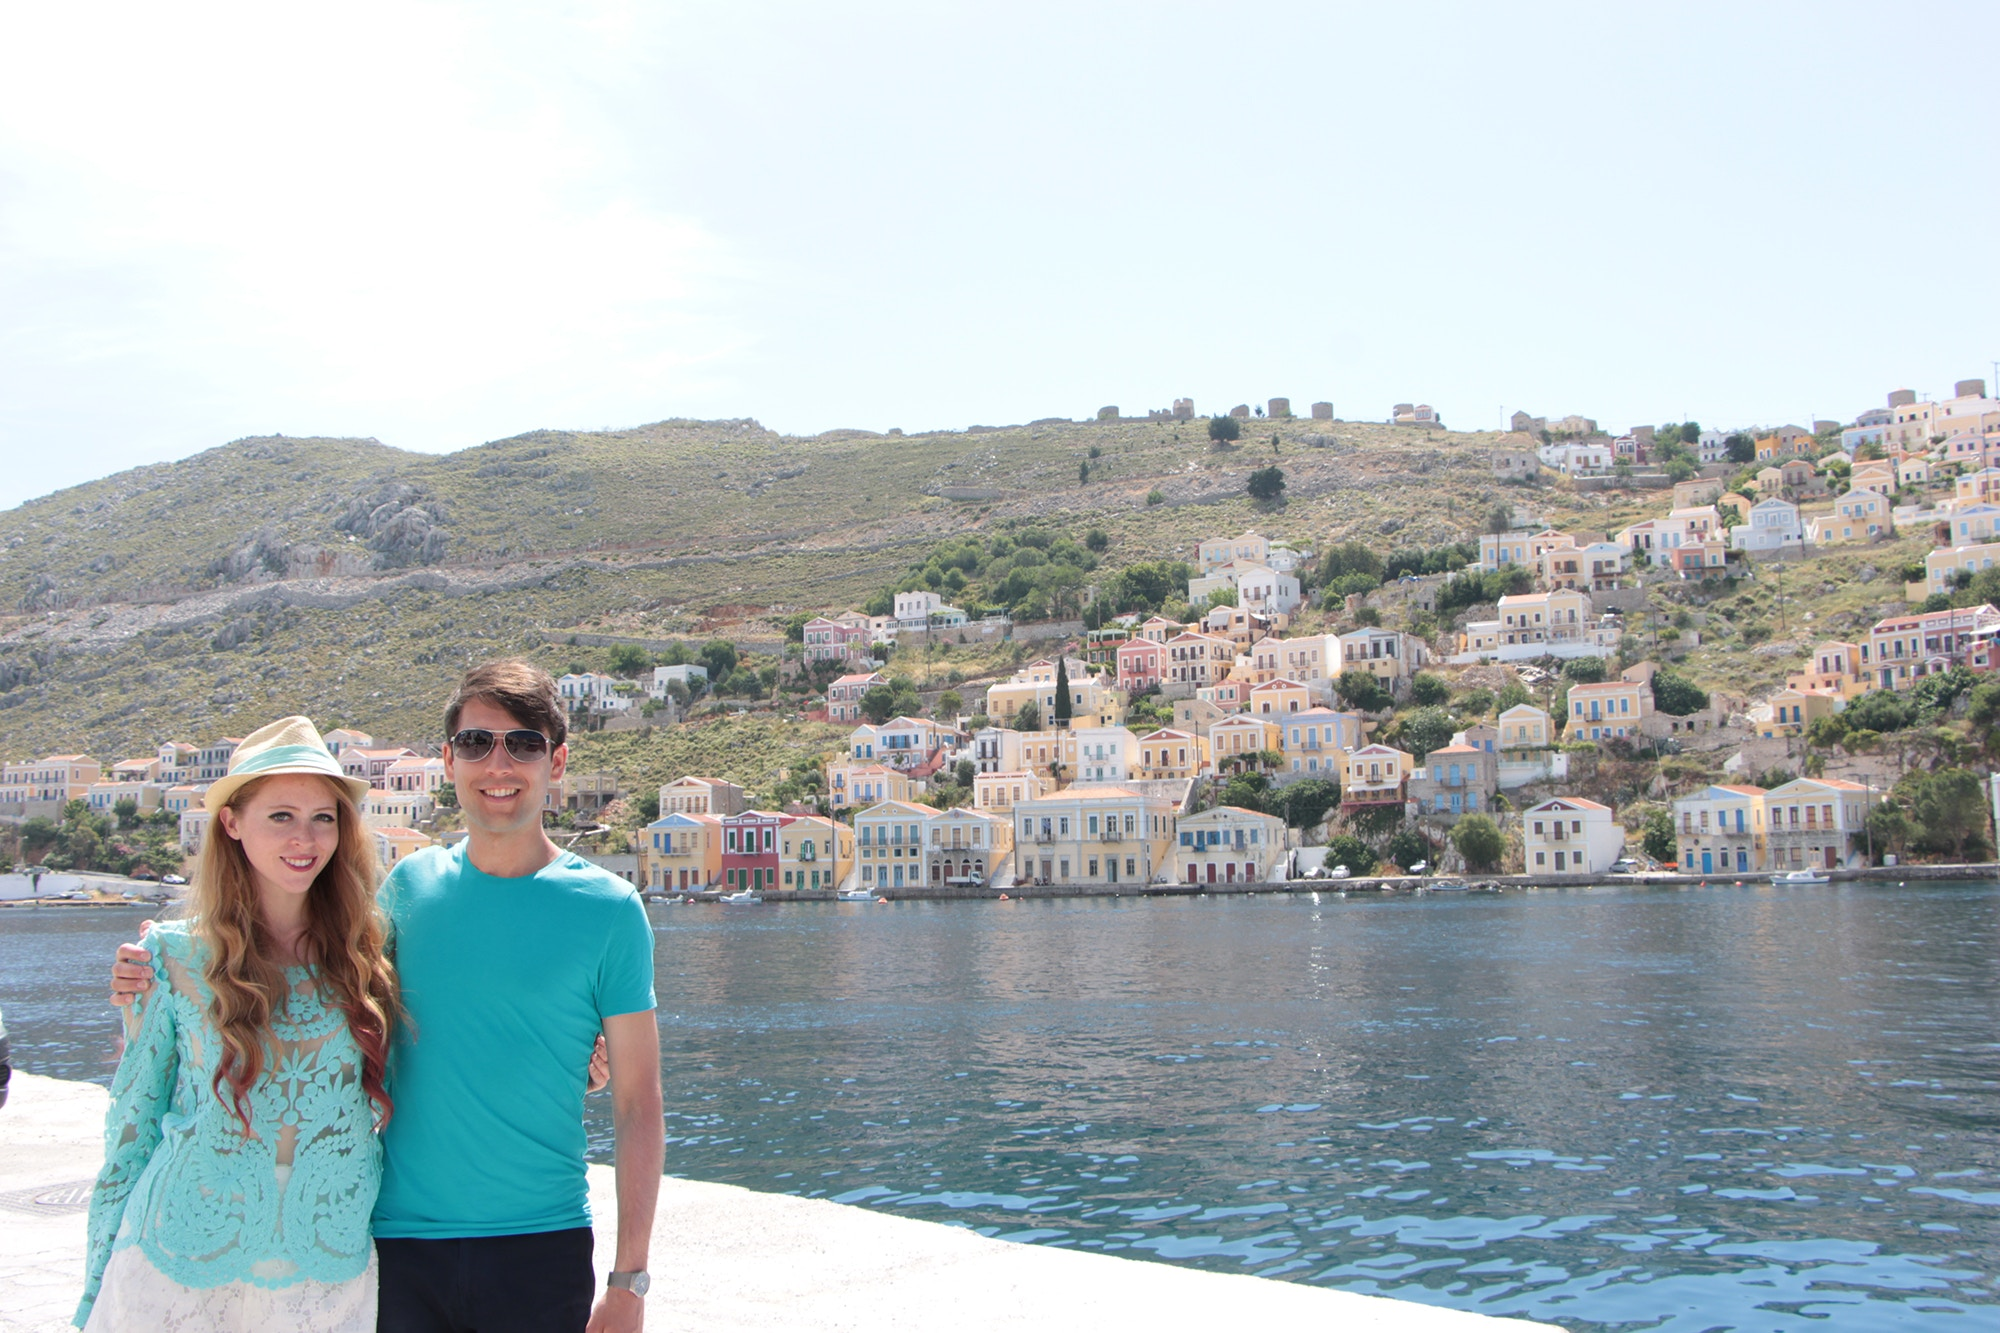 symi greece together